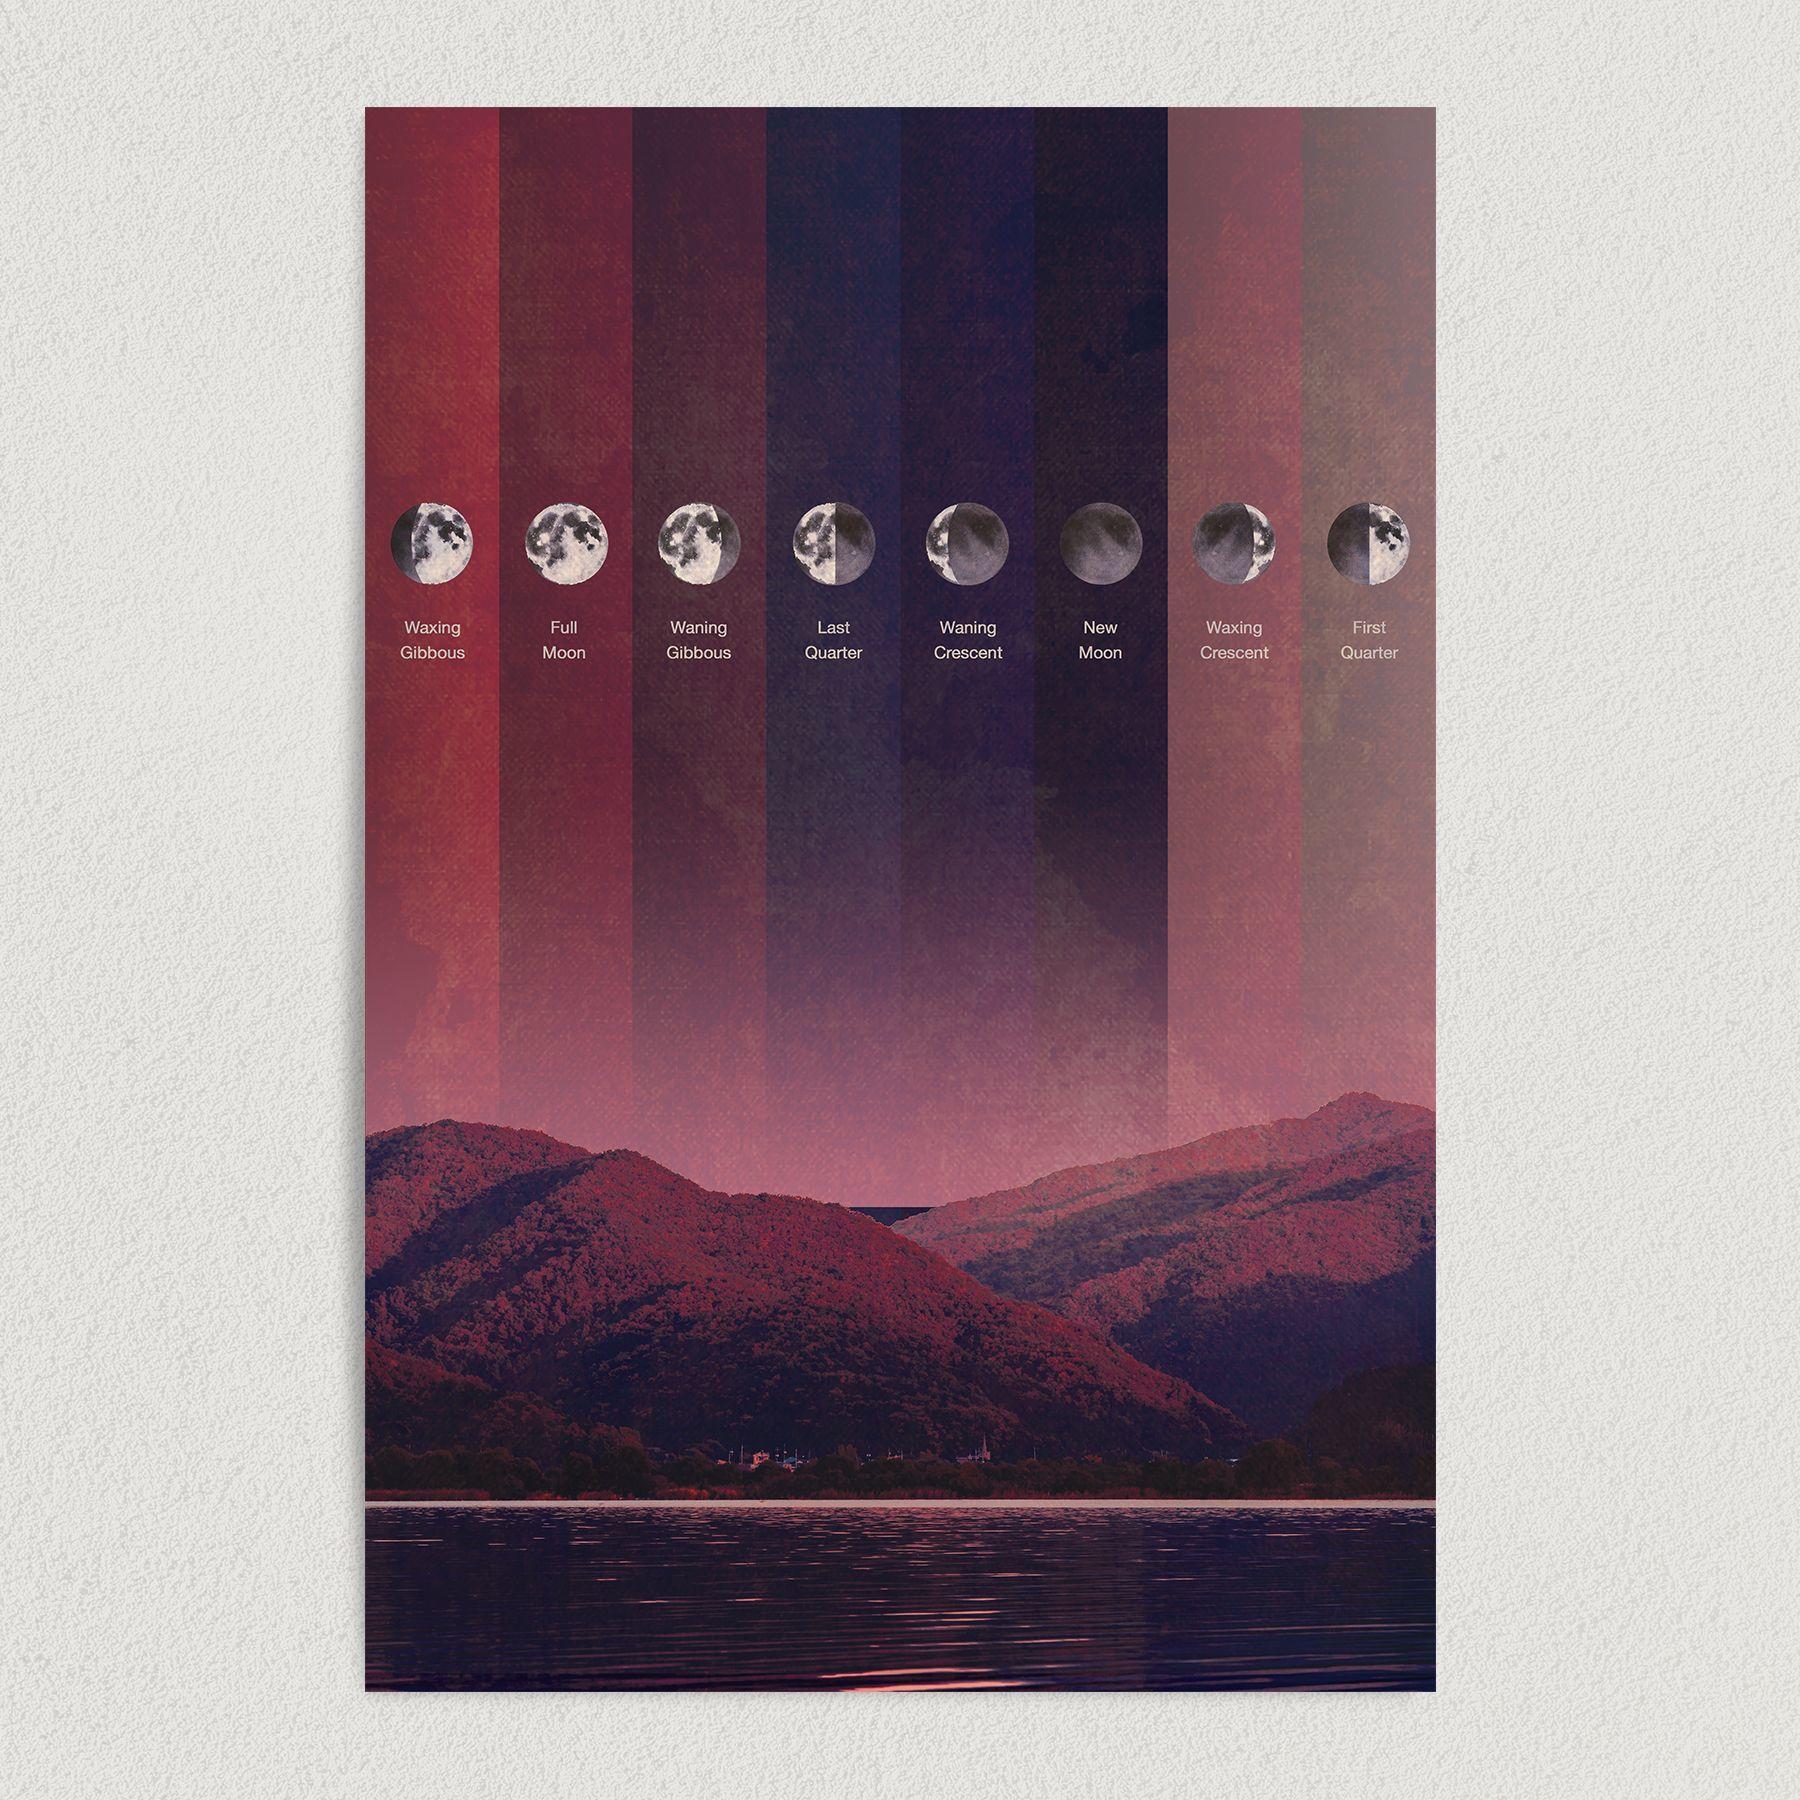 Moon Phases Surreal Lunar Cycle Art Print Poster 12″ x 18″ Wall Art S2270